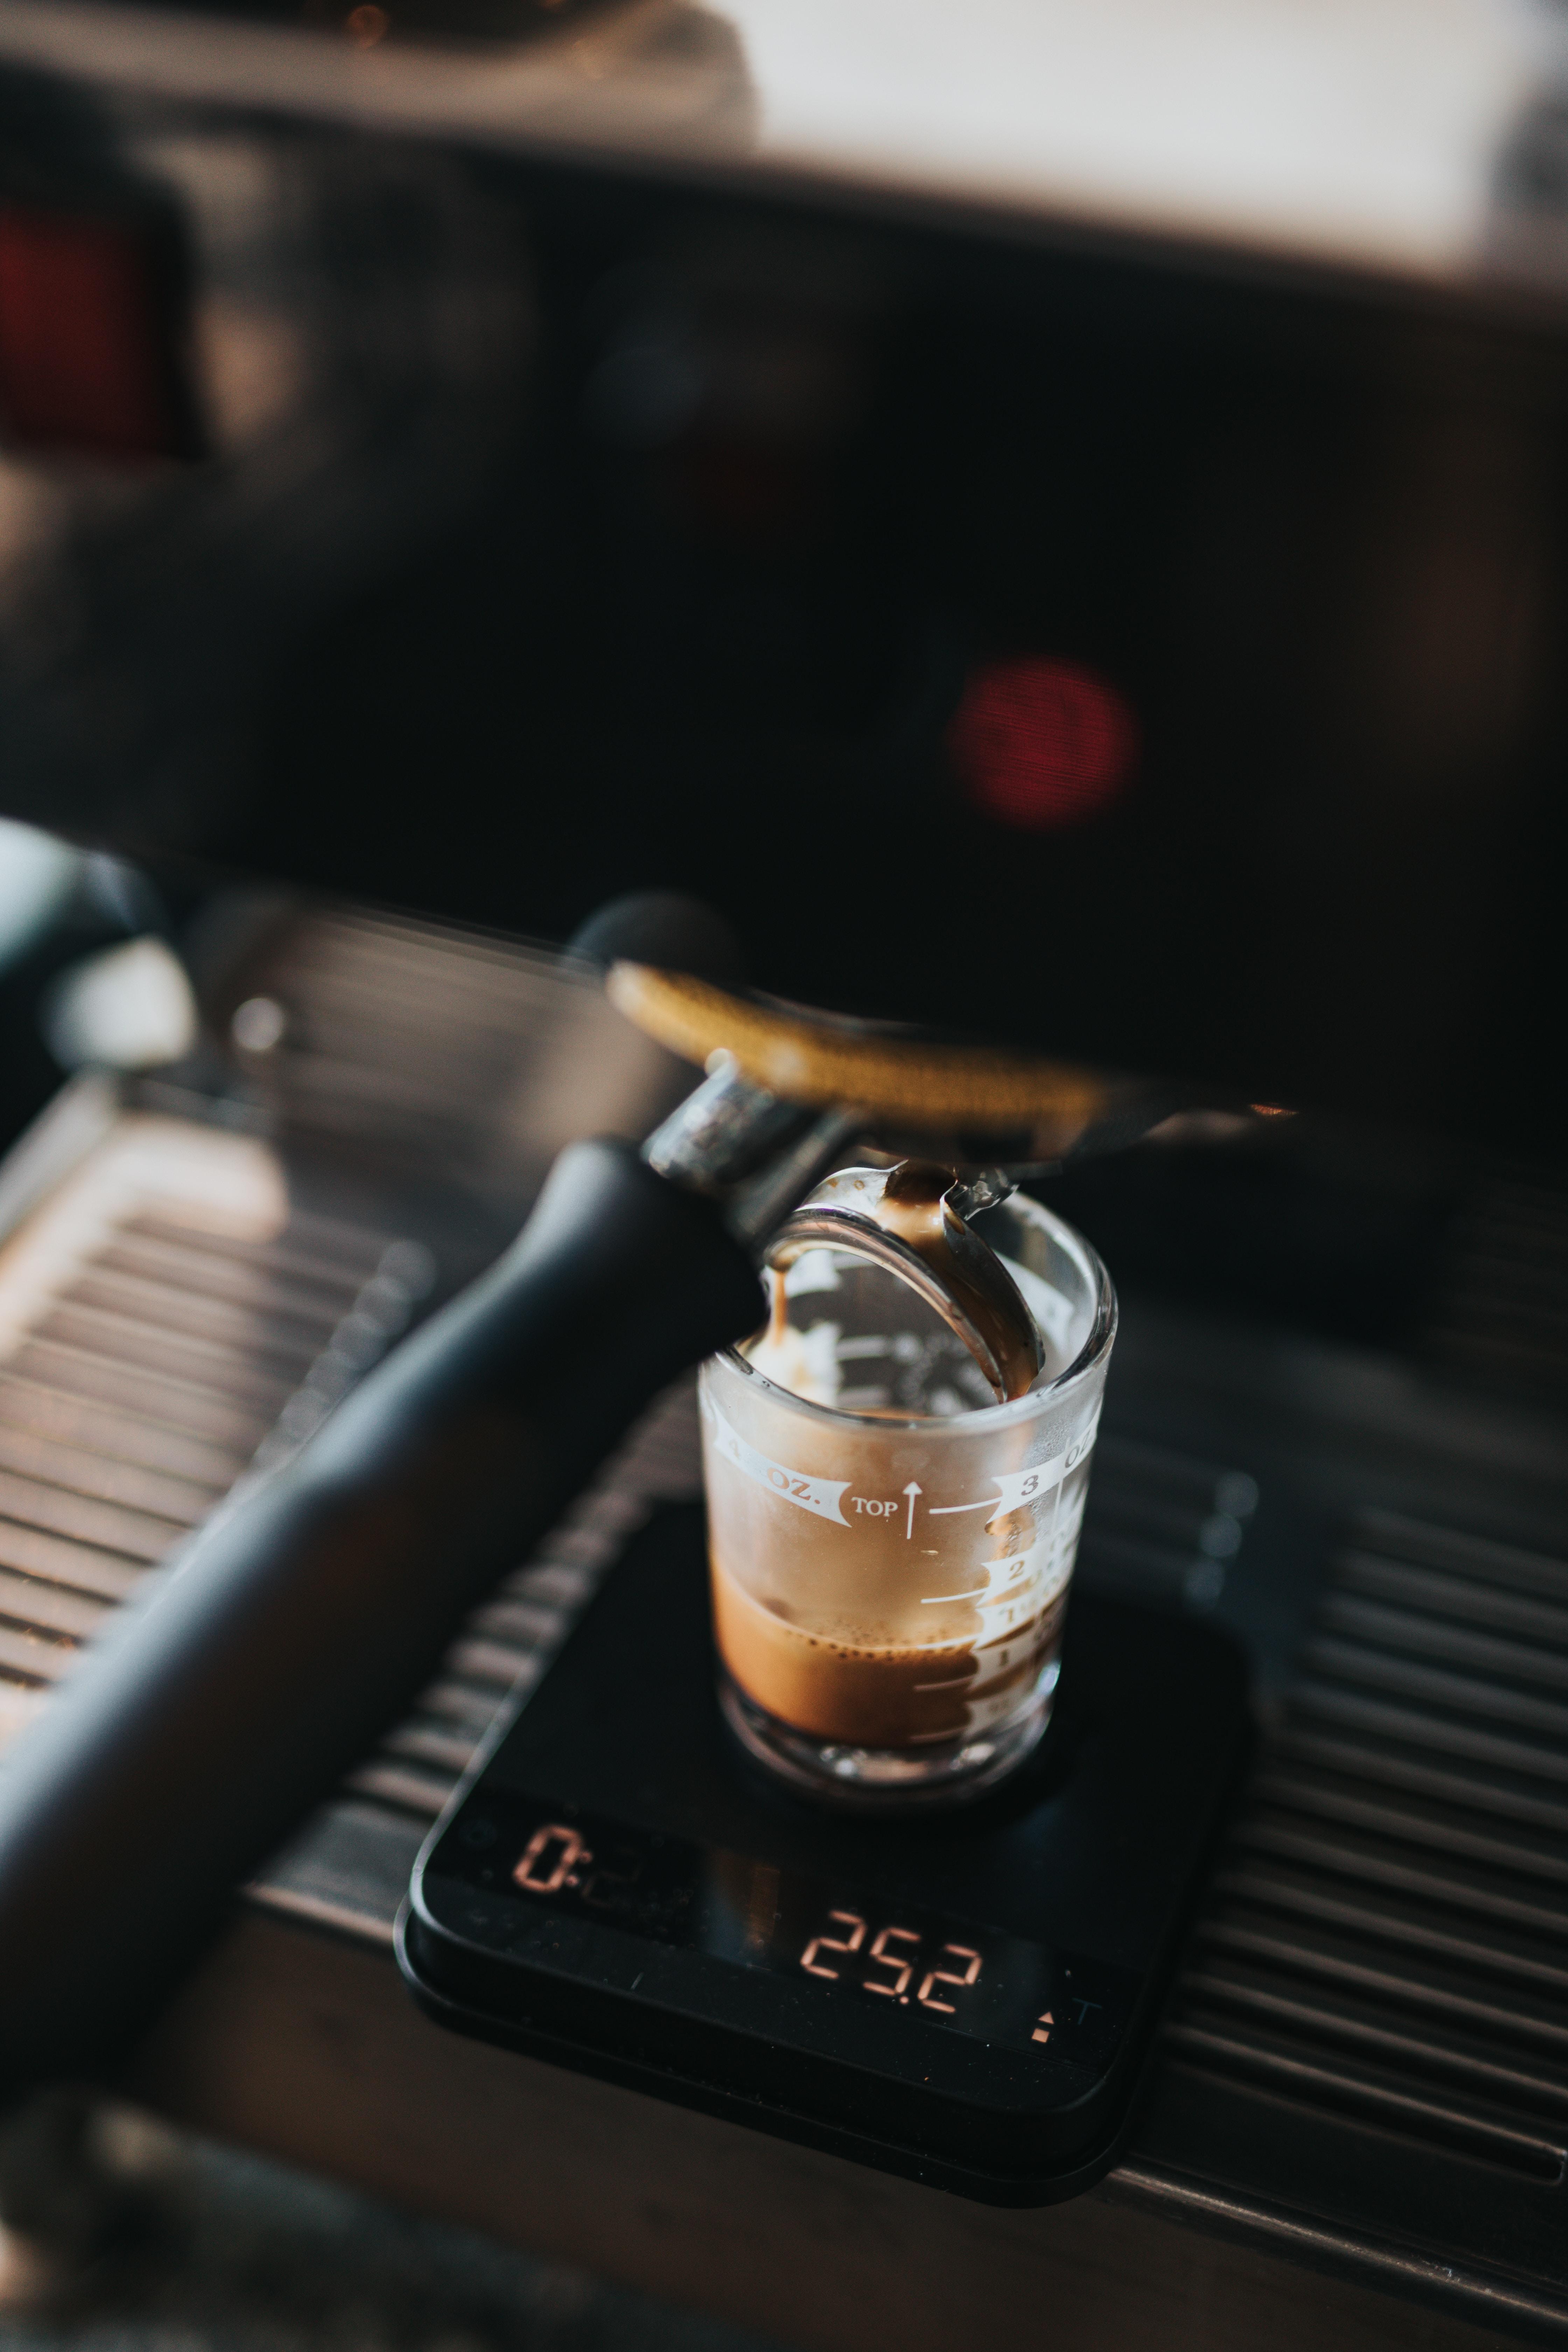 closeup photo of black espresso maker filing clear glass cup